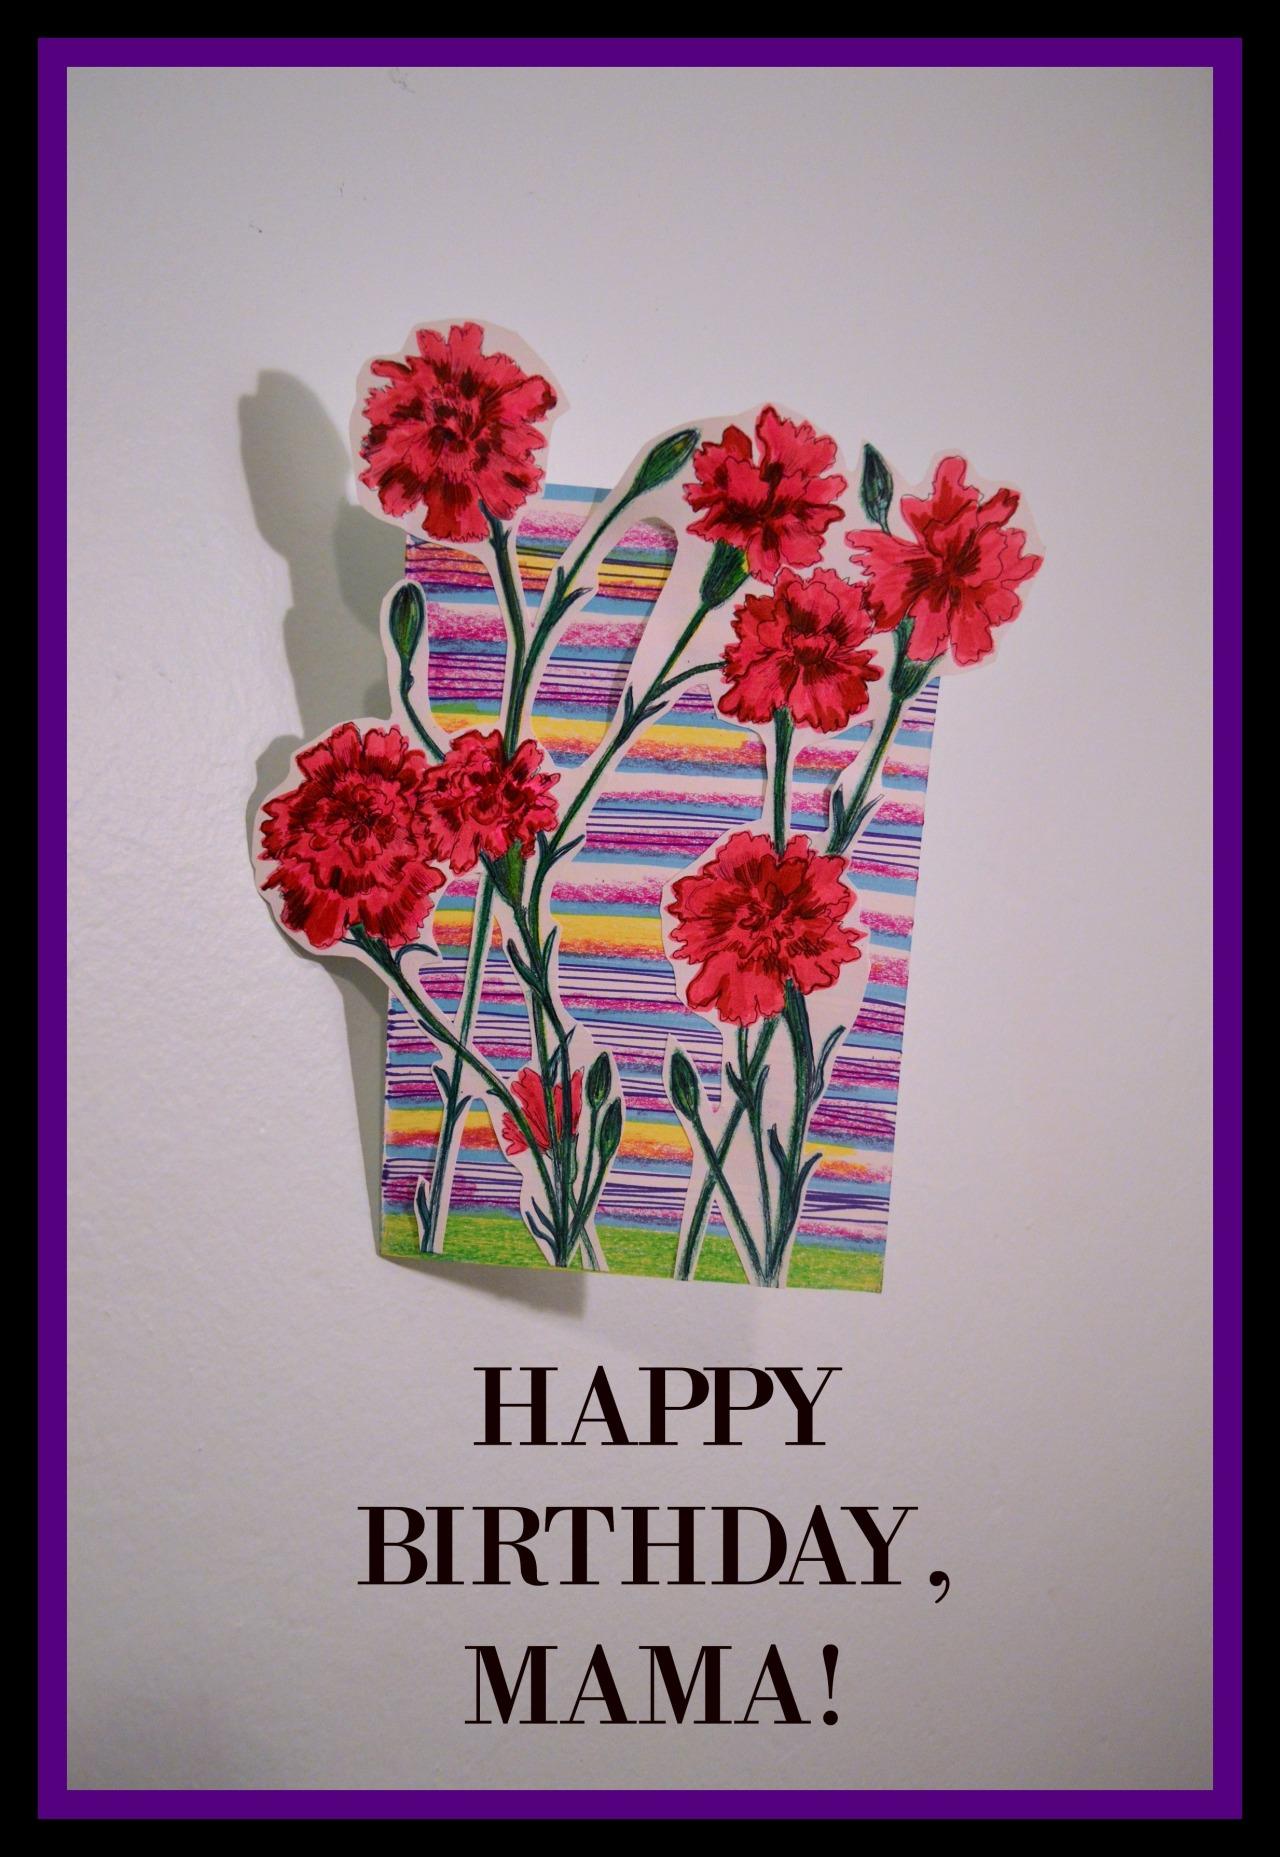 Happy Birthday, Mama! – SARAH SAMWAYS